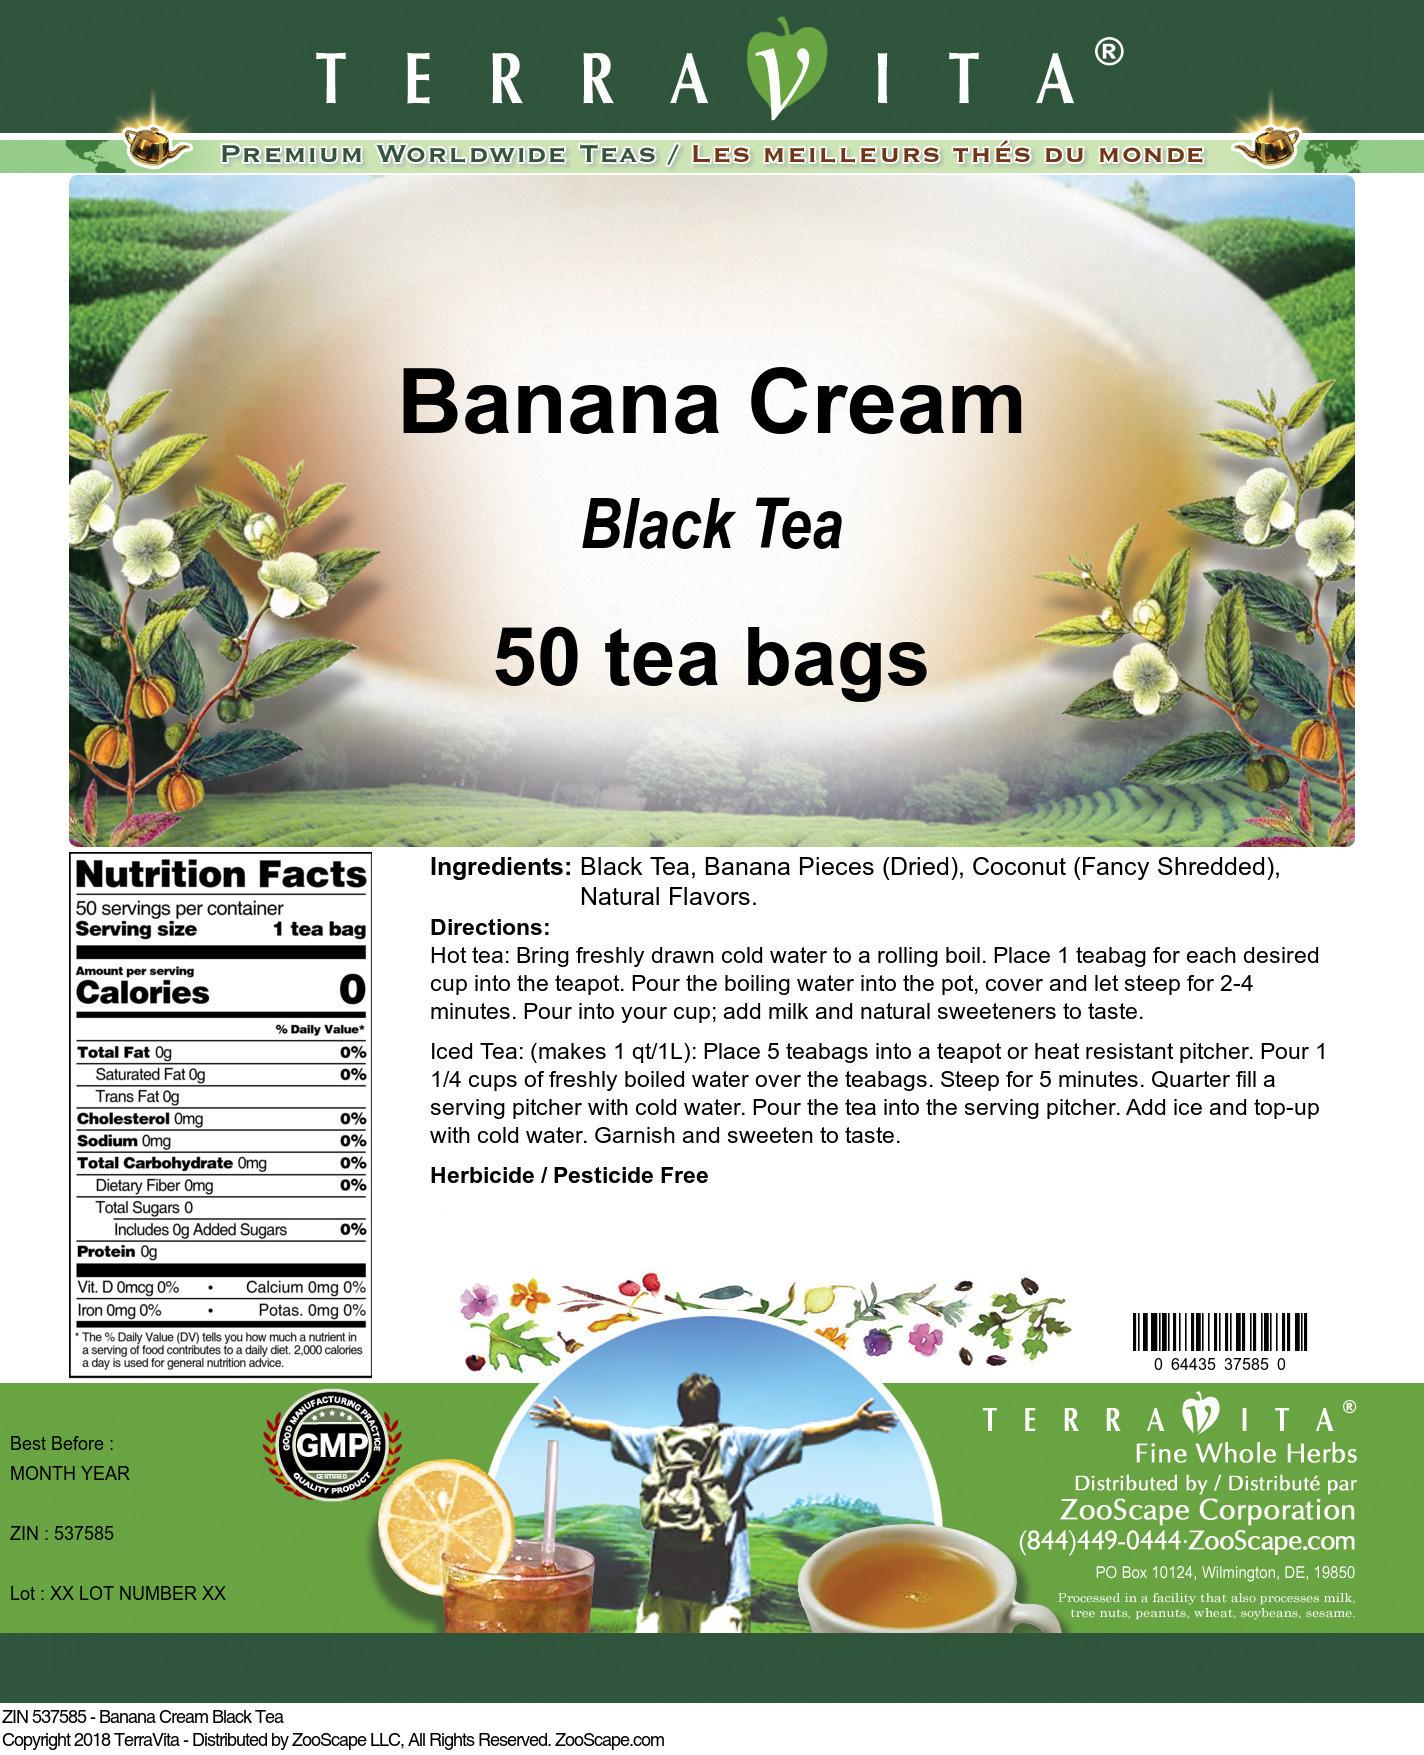 Banana Cream Black Tea